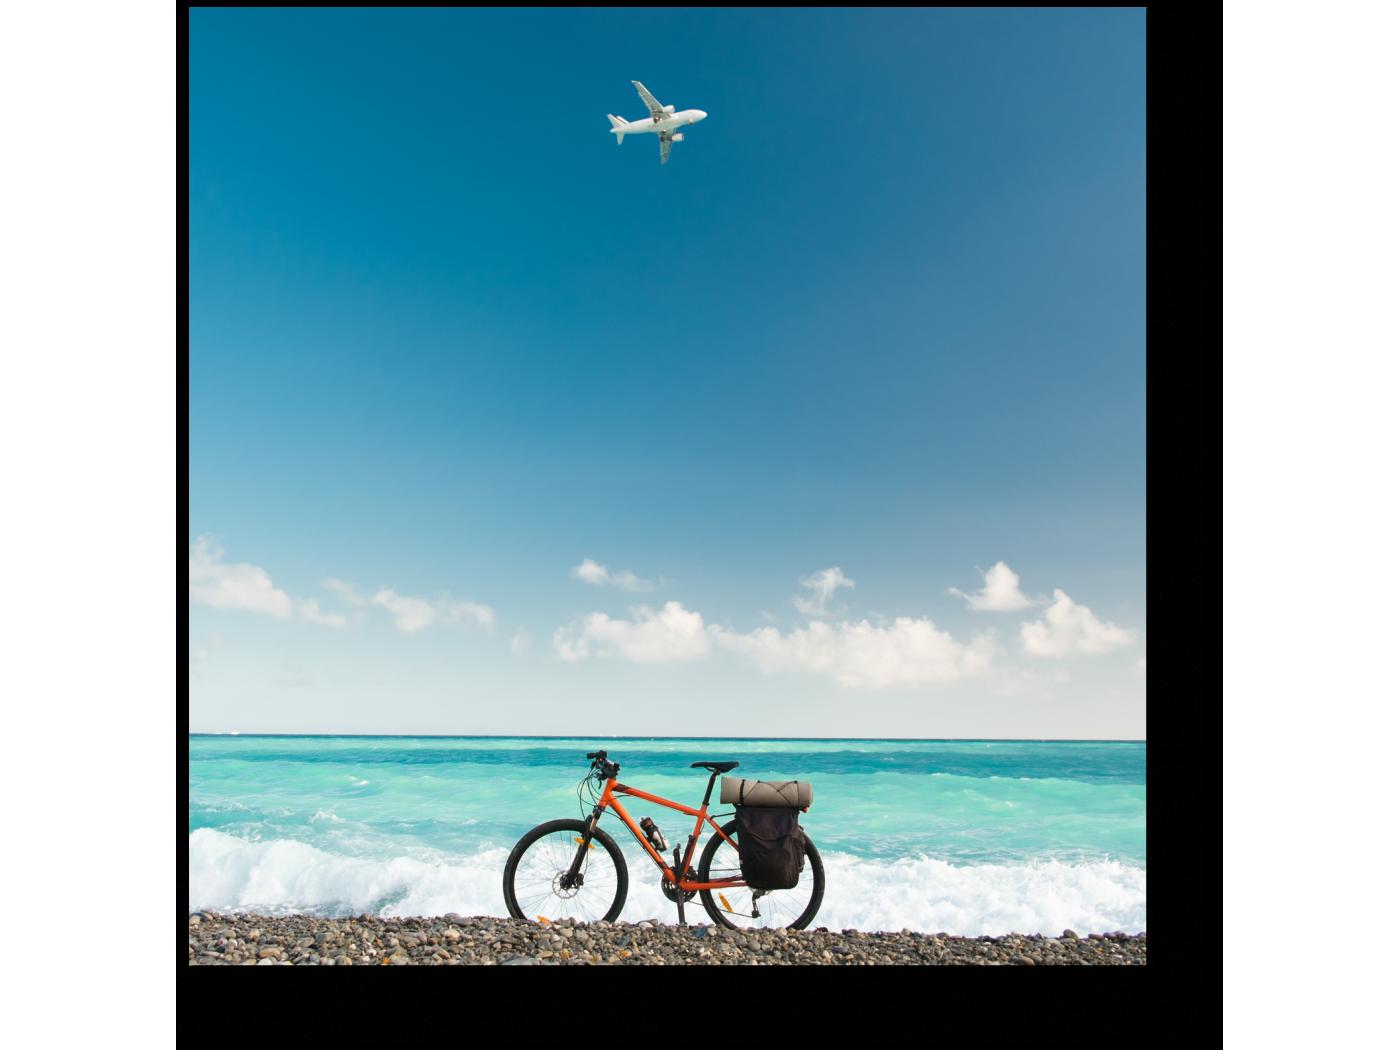 Модульная картина Велосипед у океана (20x20) фото